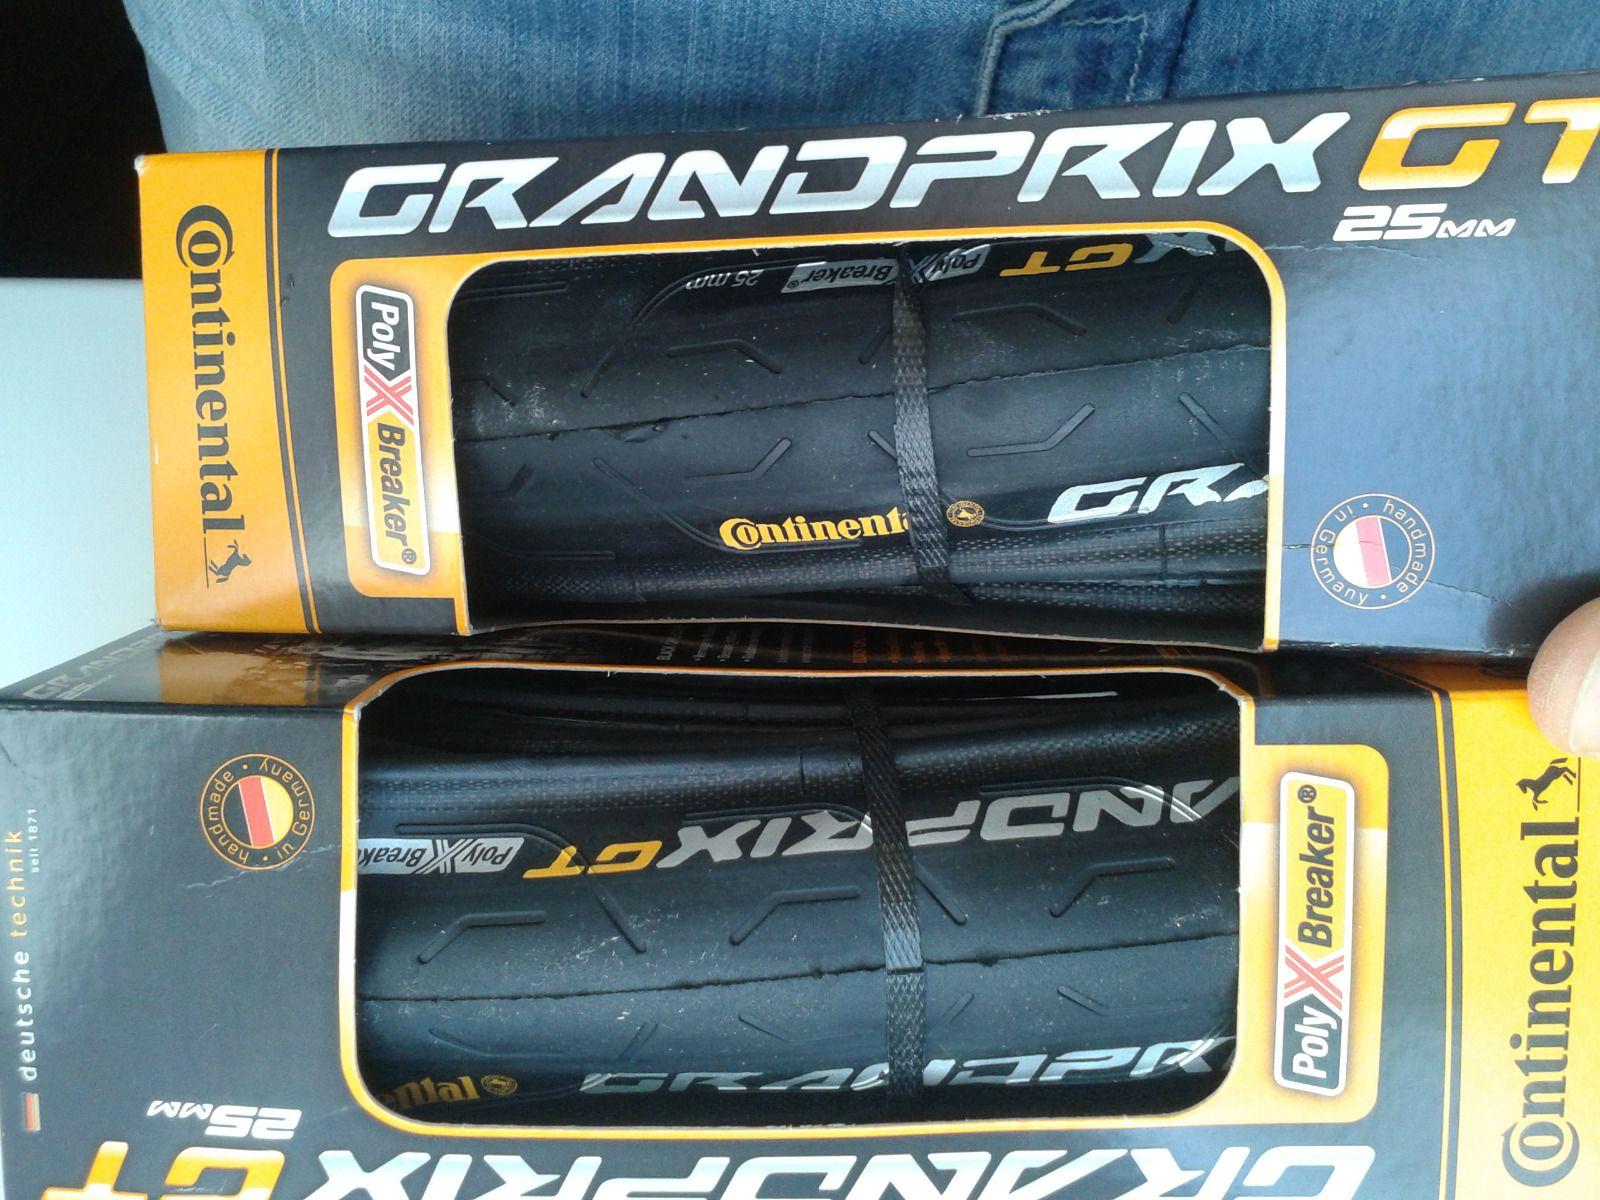 Continental Grand Prix GT 25-622